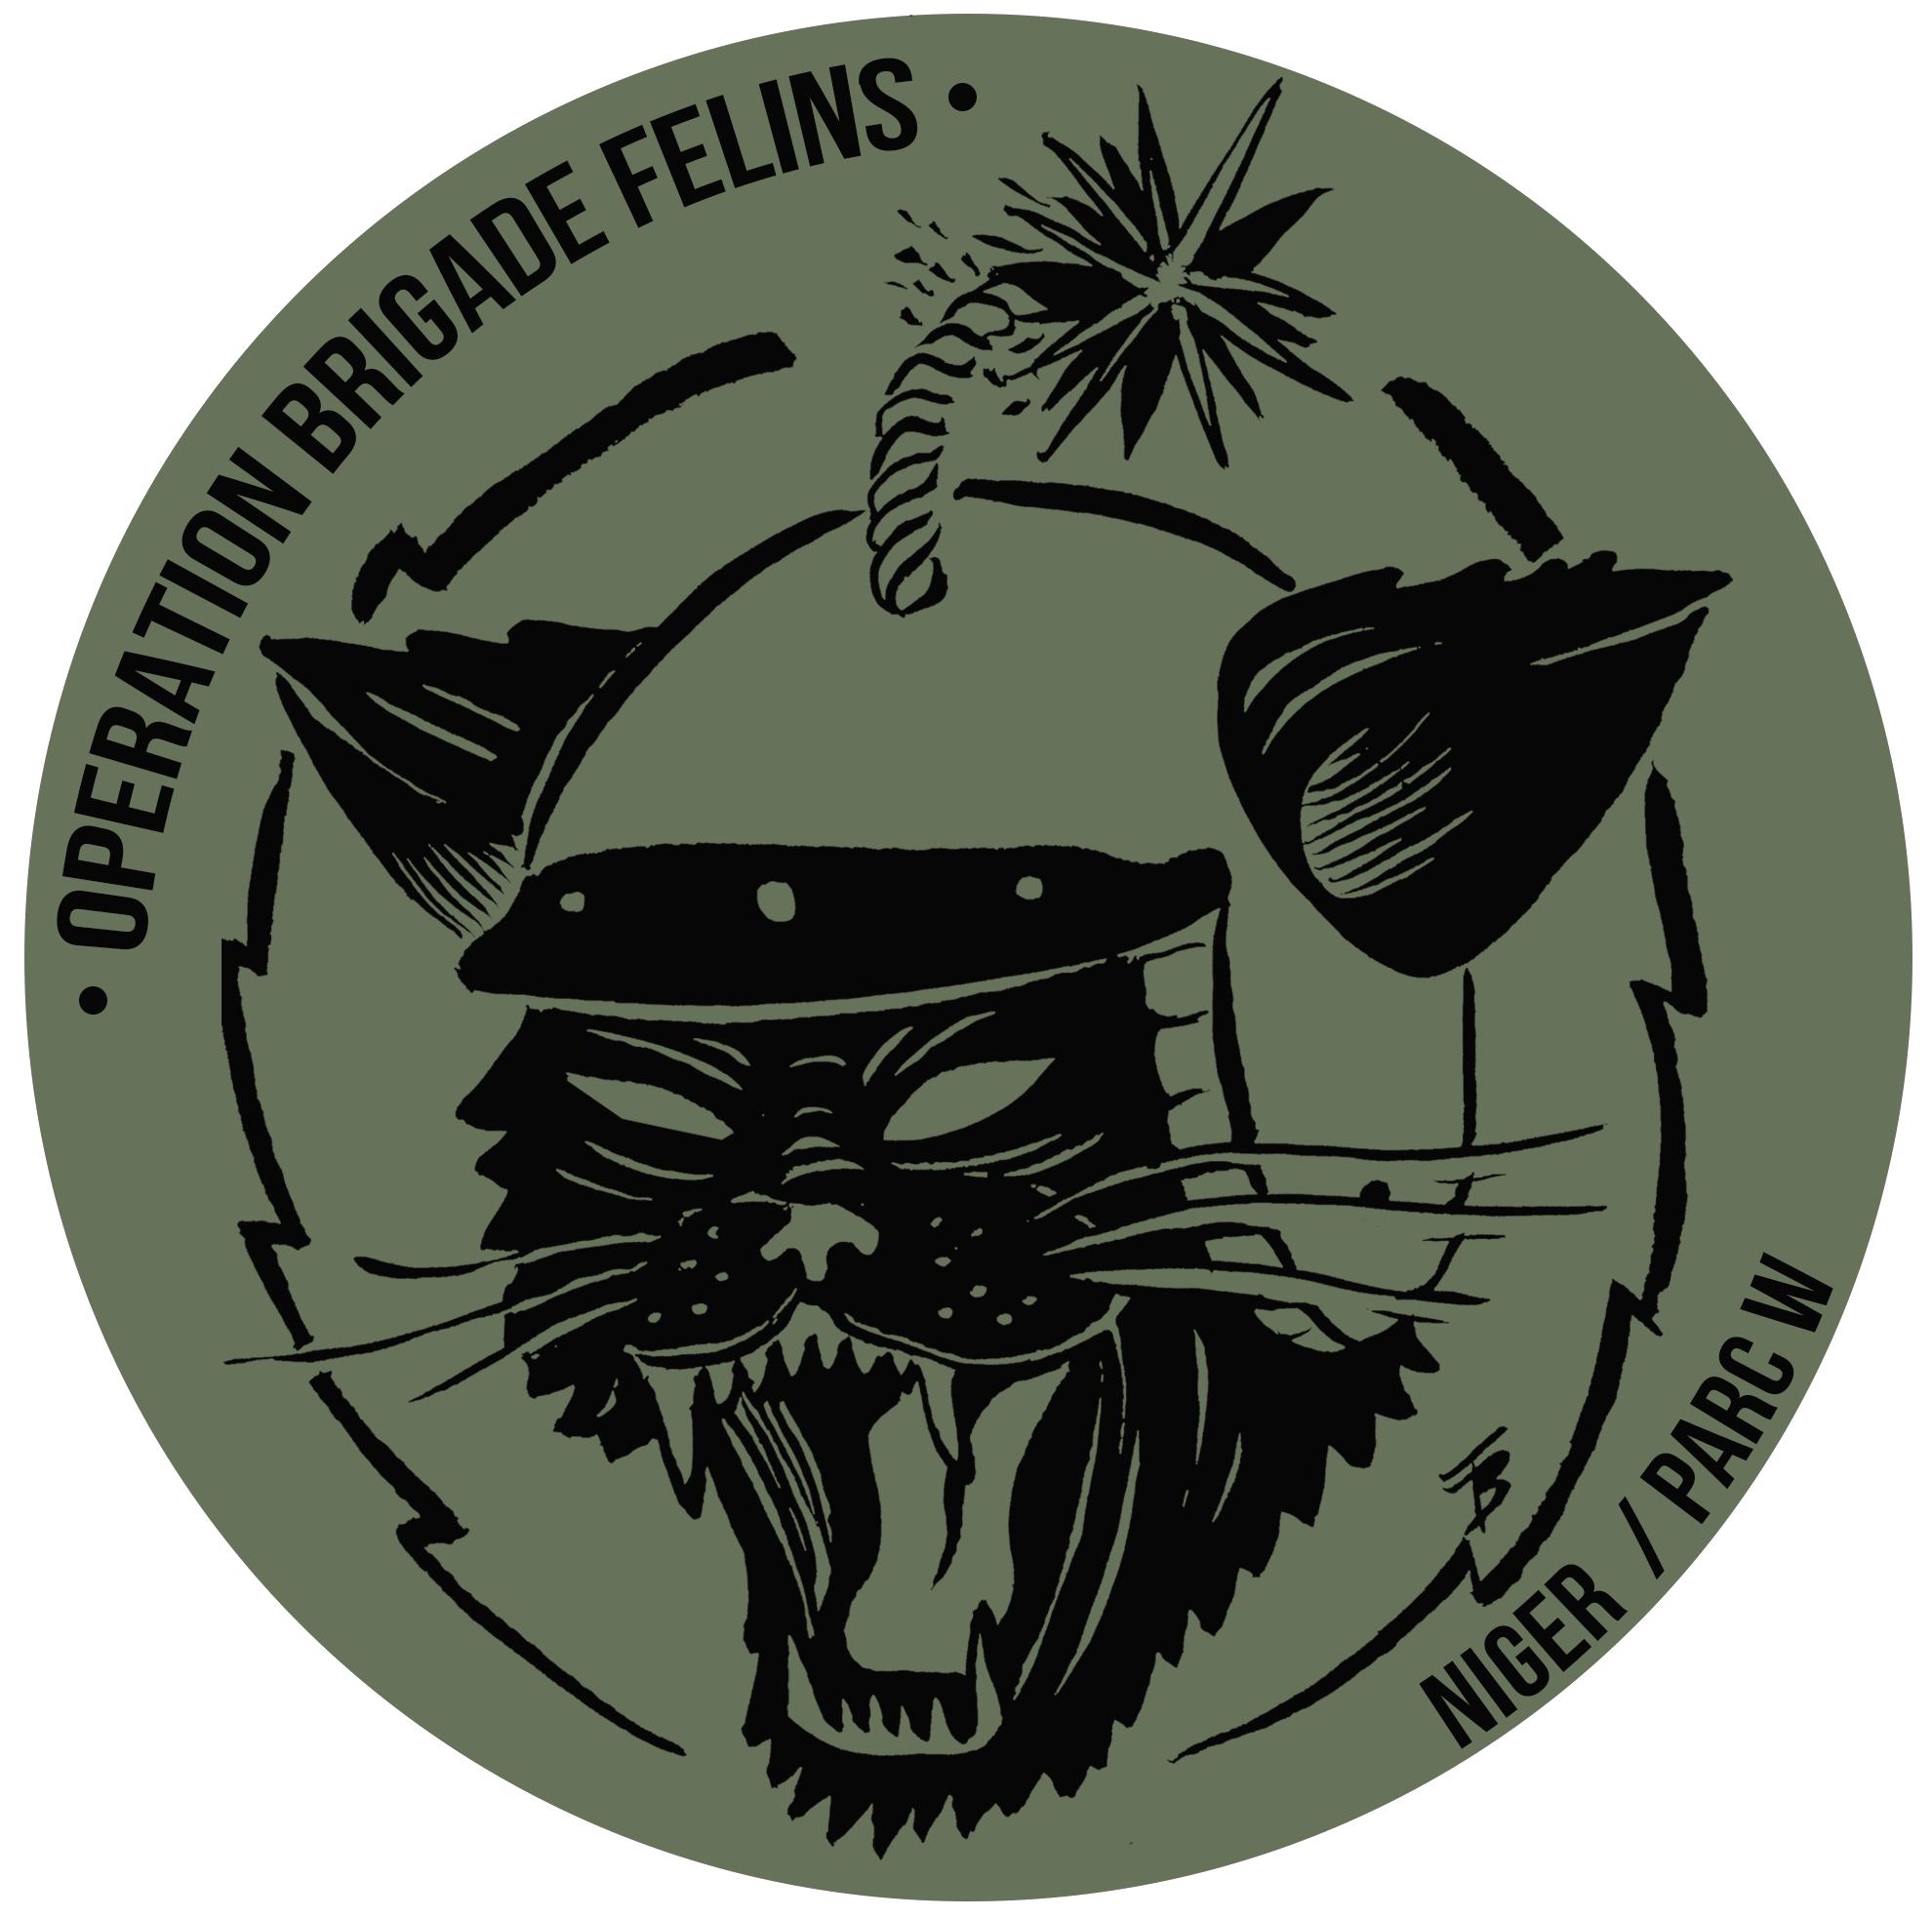 Operationbrigadefelins